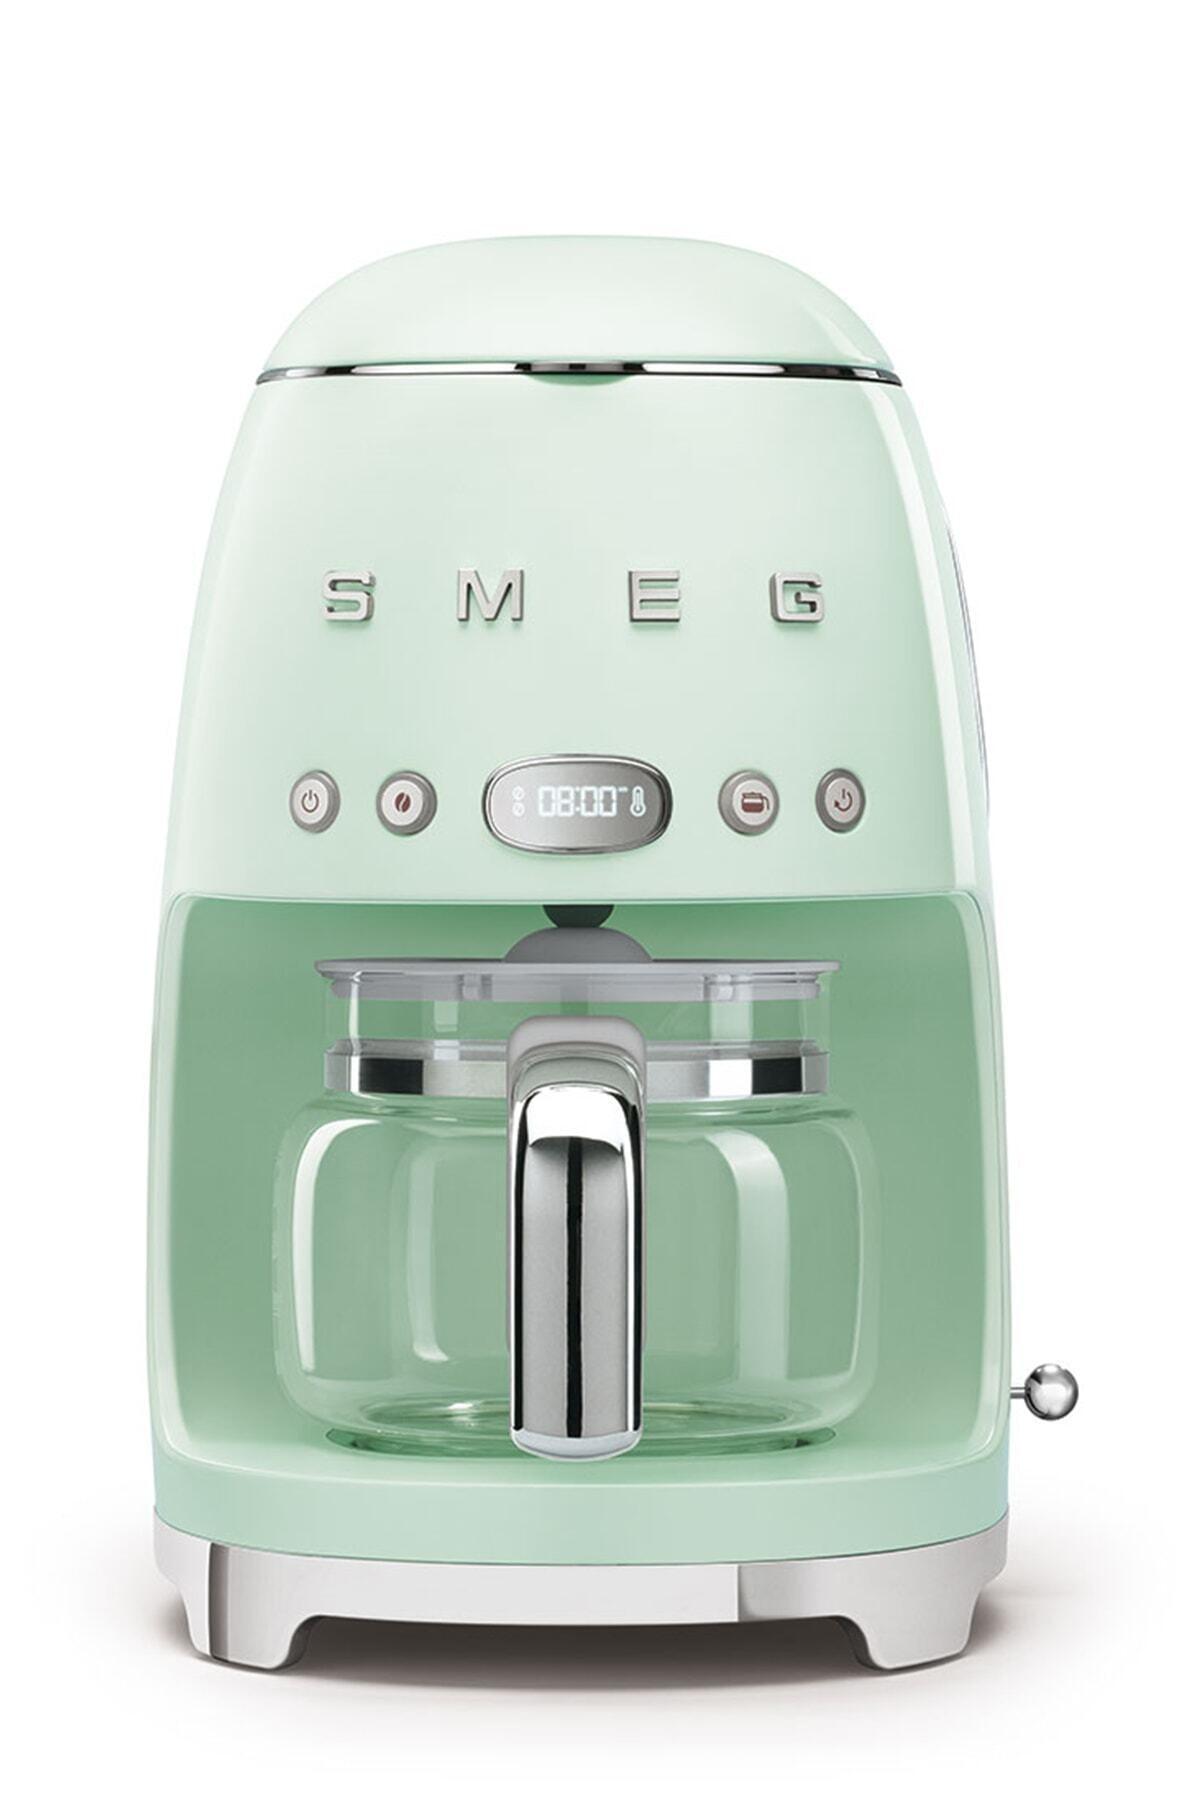 SMEG Pastel Yeşil Boyalı Çelik Kasa Filtre Kahve Makinesi Dcf02pgeu 1